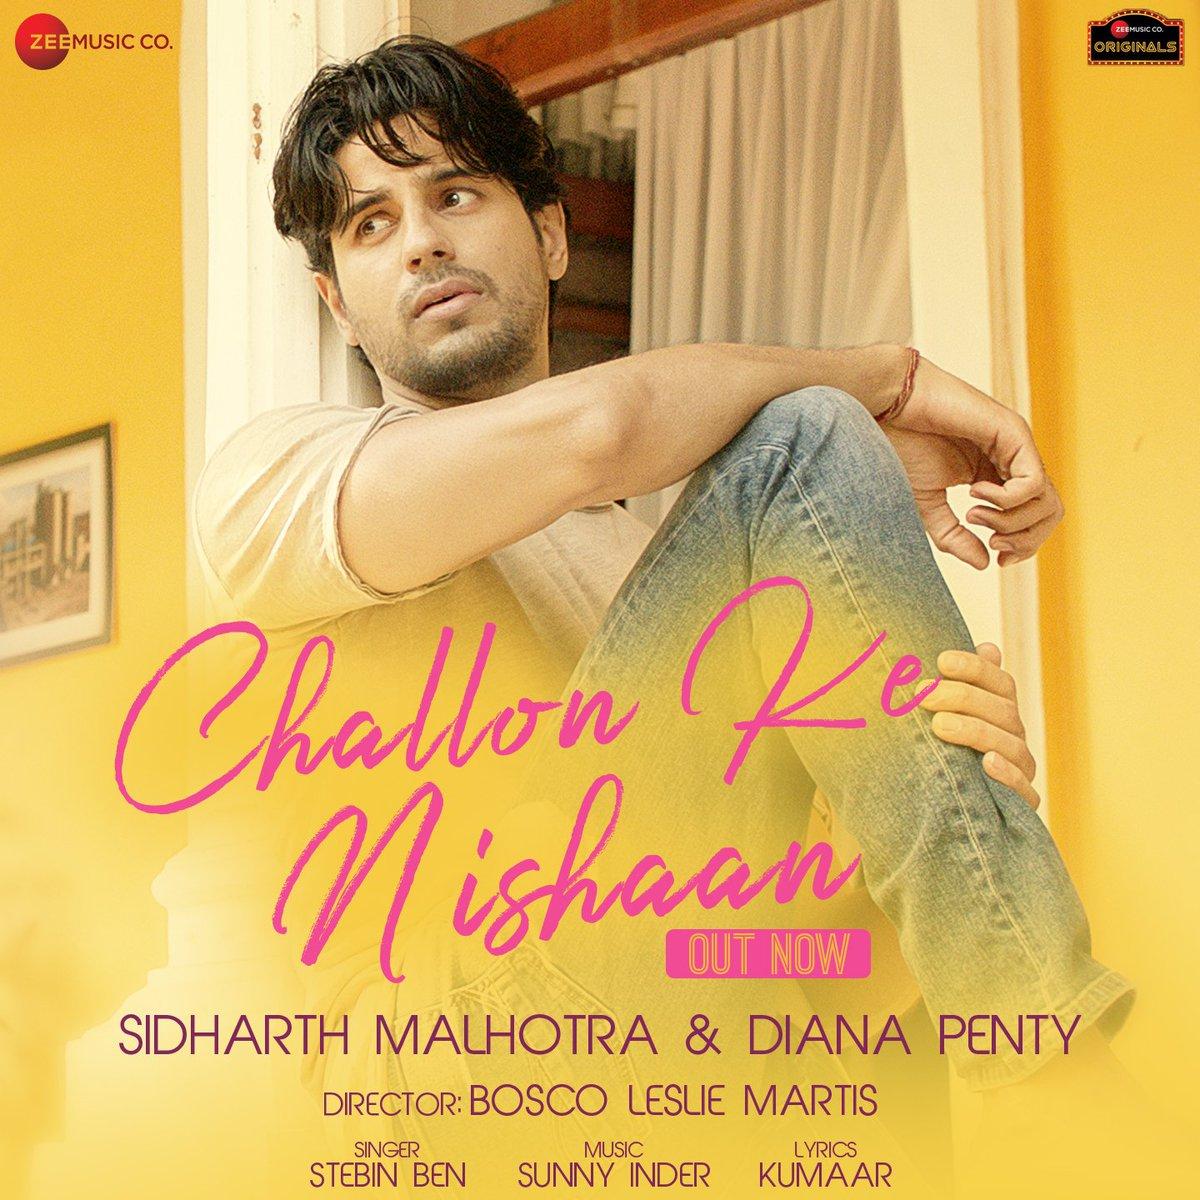 वक्त बेवफ़ाई ना करता  तो हम साथ होते  तनहाइयों की जगह आज  हाथ में तेरे हाथ होते #ChallonKeNishaan song is OUT  NOW!! . >>    @SidMalhotra @DianaPenty @kumaarofficial #SunnyInder @BoscoMartis @anuragbedi @ZeeMusicCompany